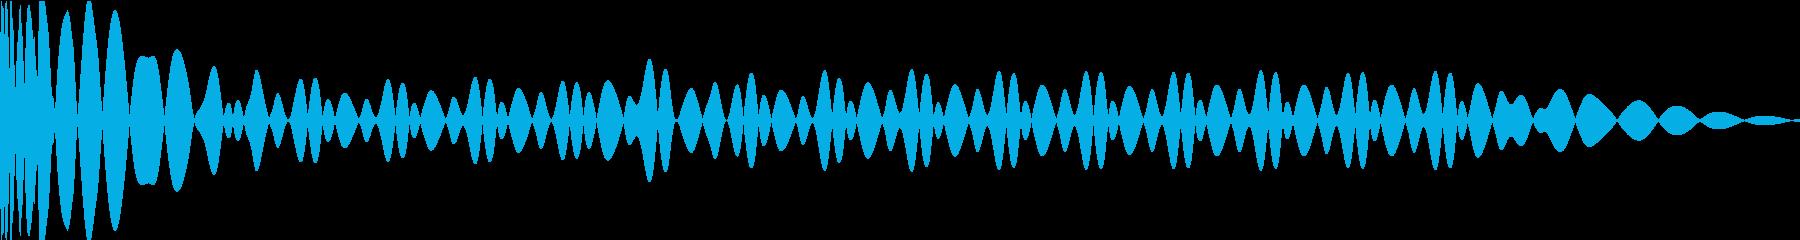 EDMキック キーD#の再生済みの波形